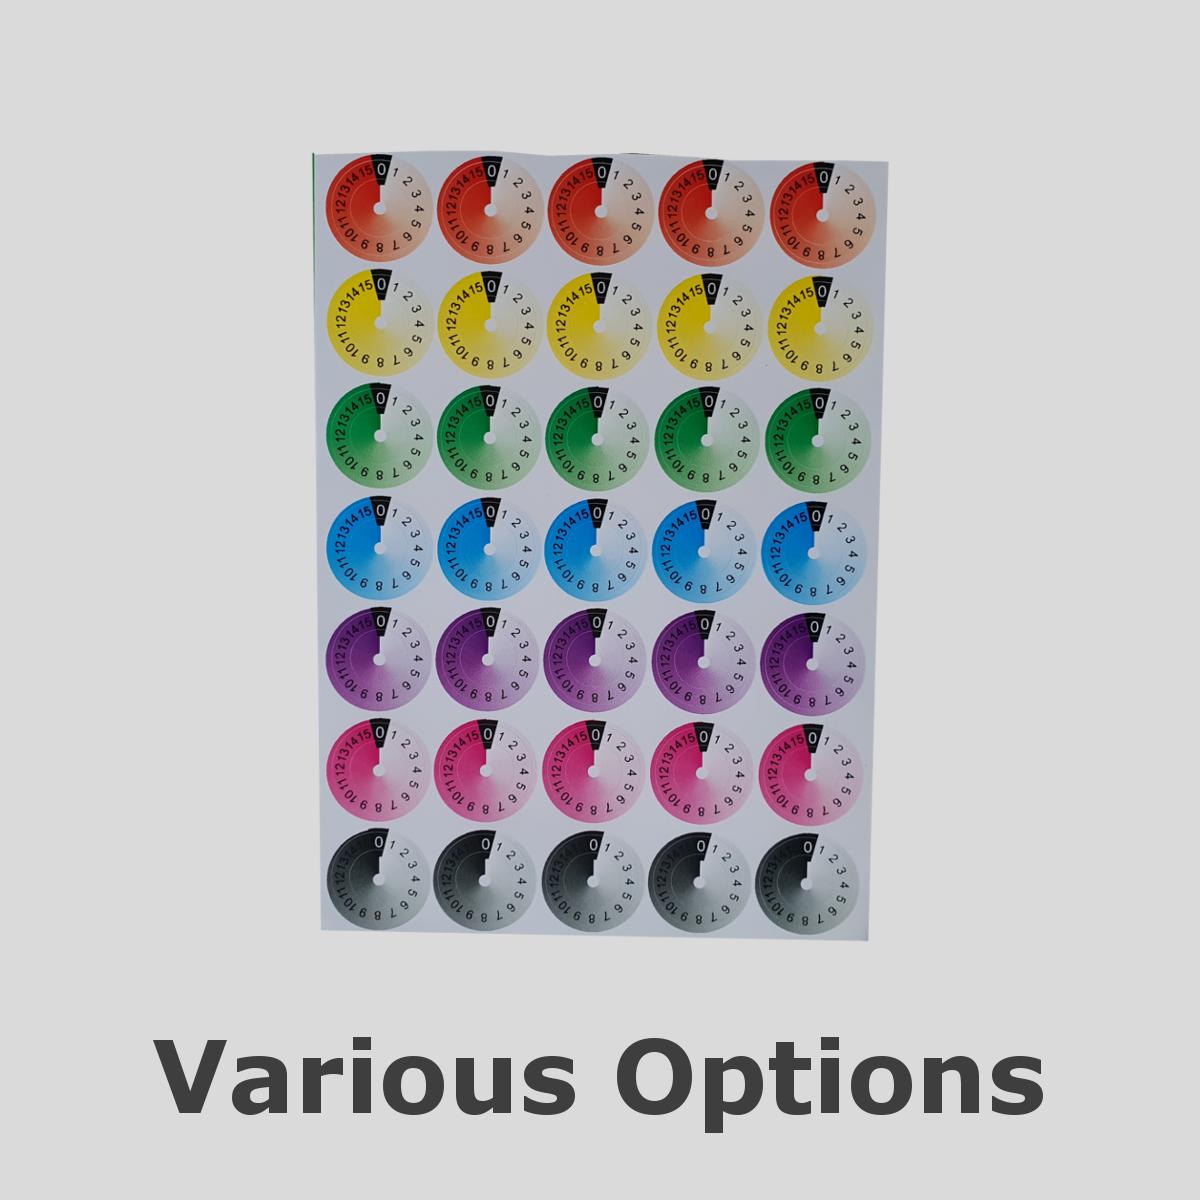 ROTARY STICKERS various versions | SIM STICKERS